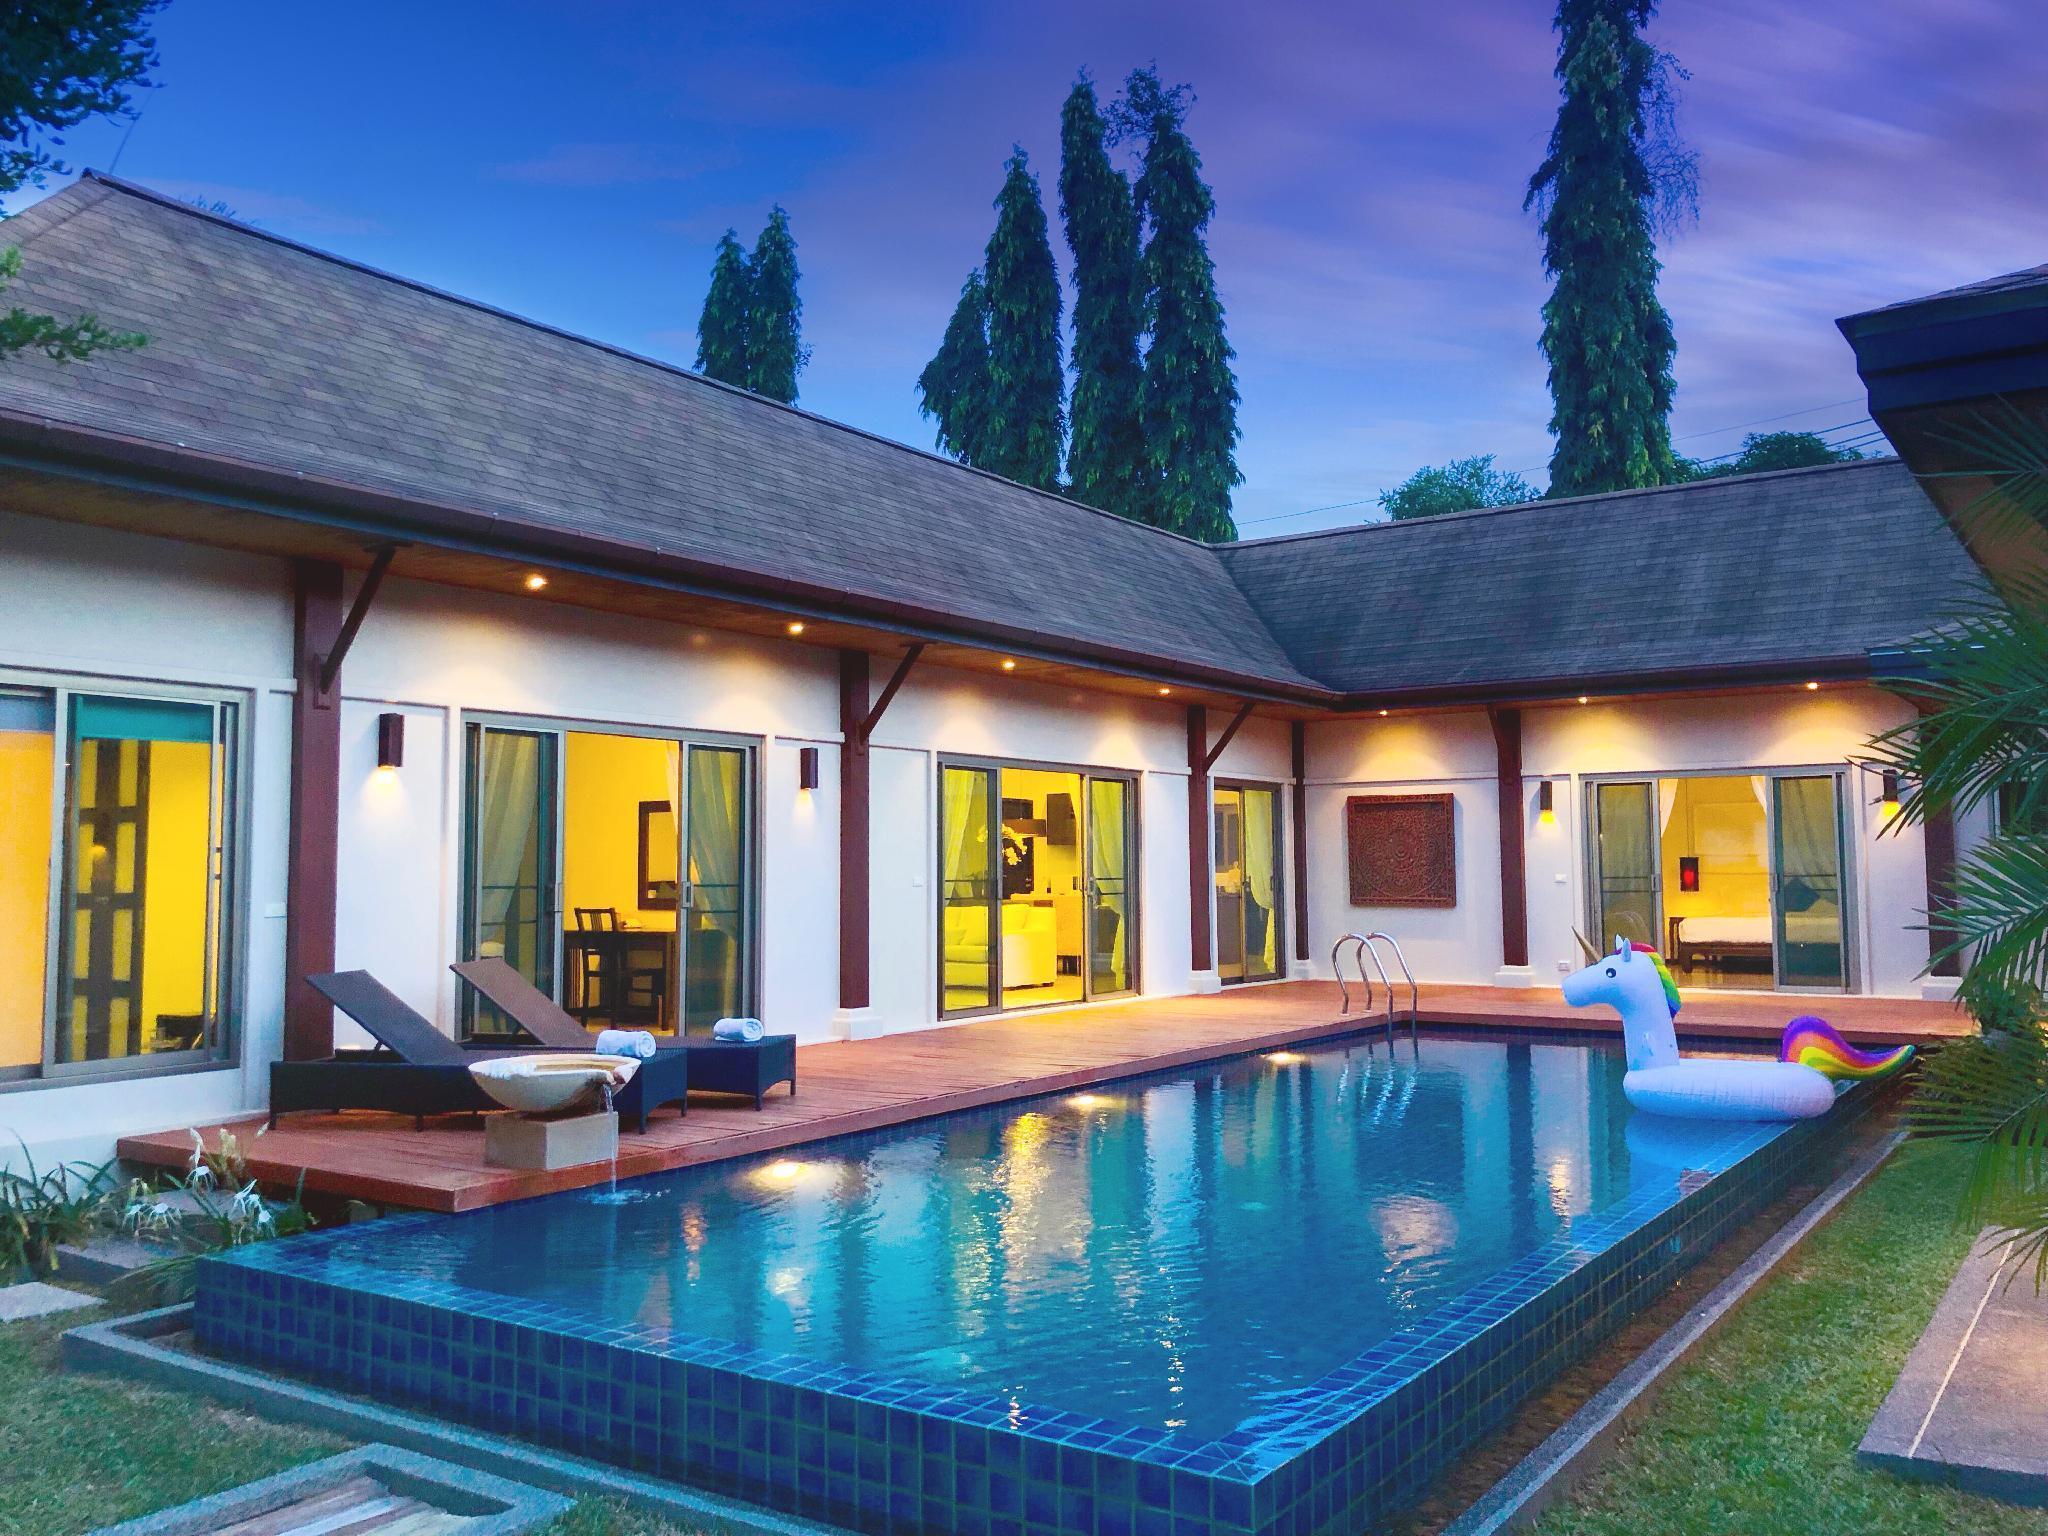 Naiharn Beac Tropical Garden Sea Salt Pool Villa วิลลา 3 ห้องนอน 3 ห้องน้ำส่วนตัว ขนาด 350 ตร.ม. – ในหาน